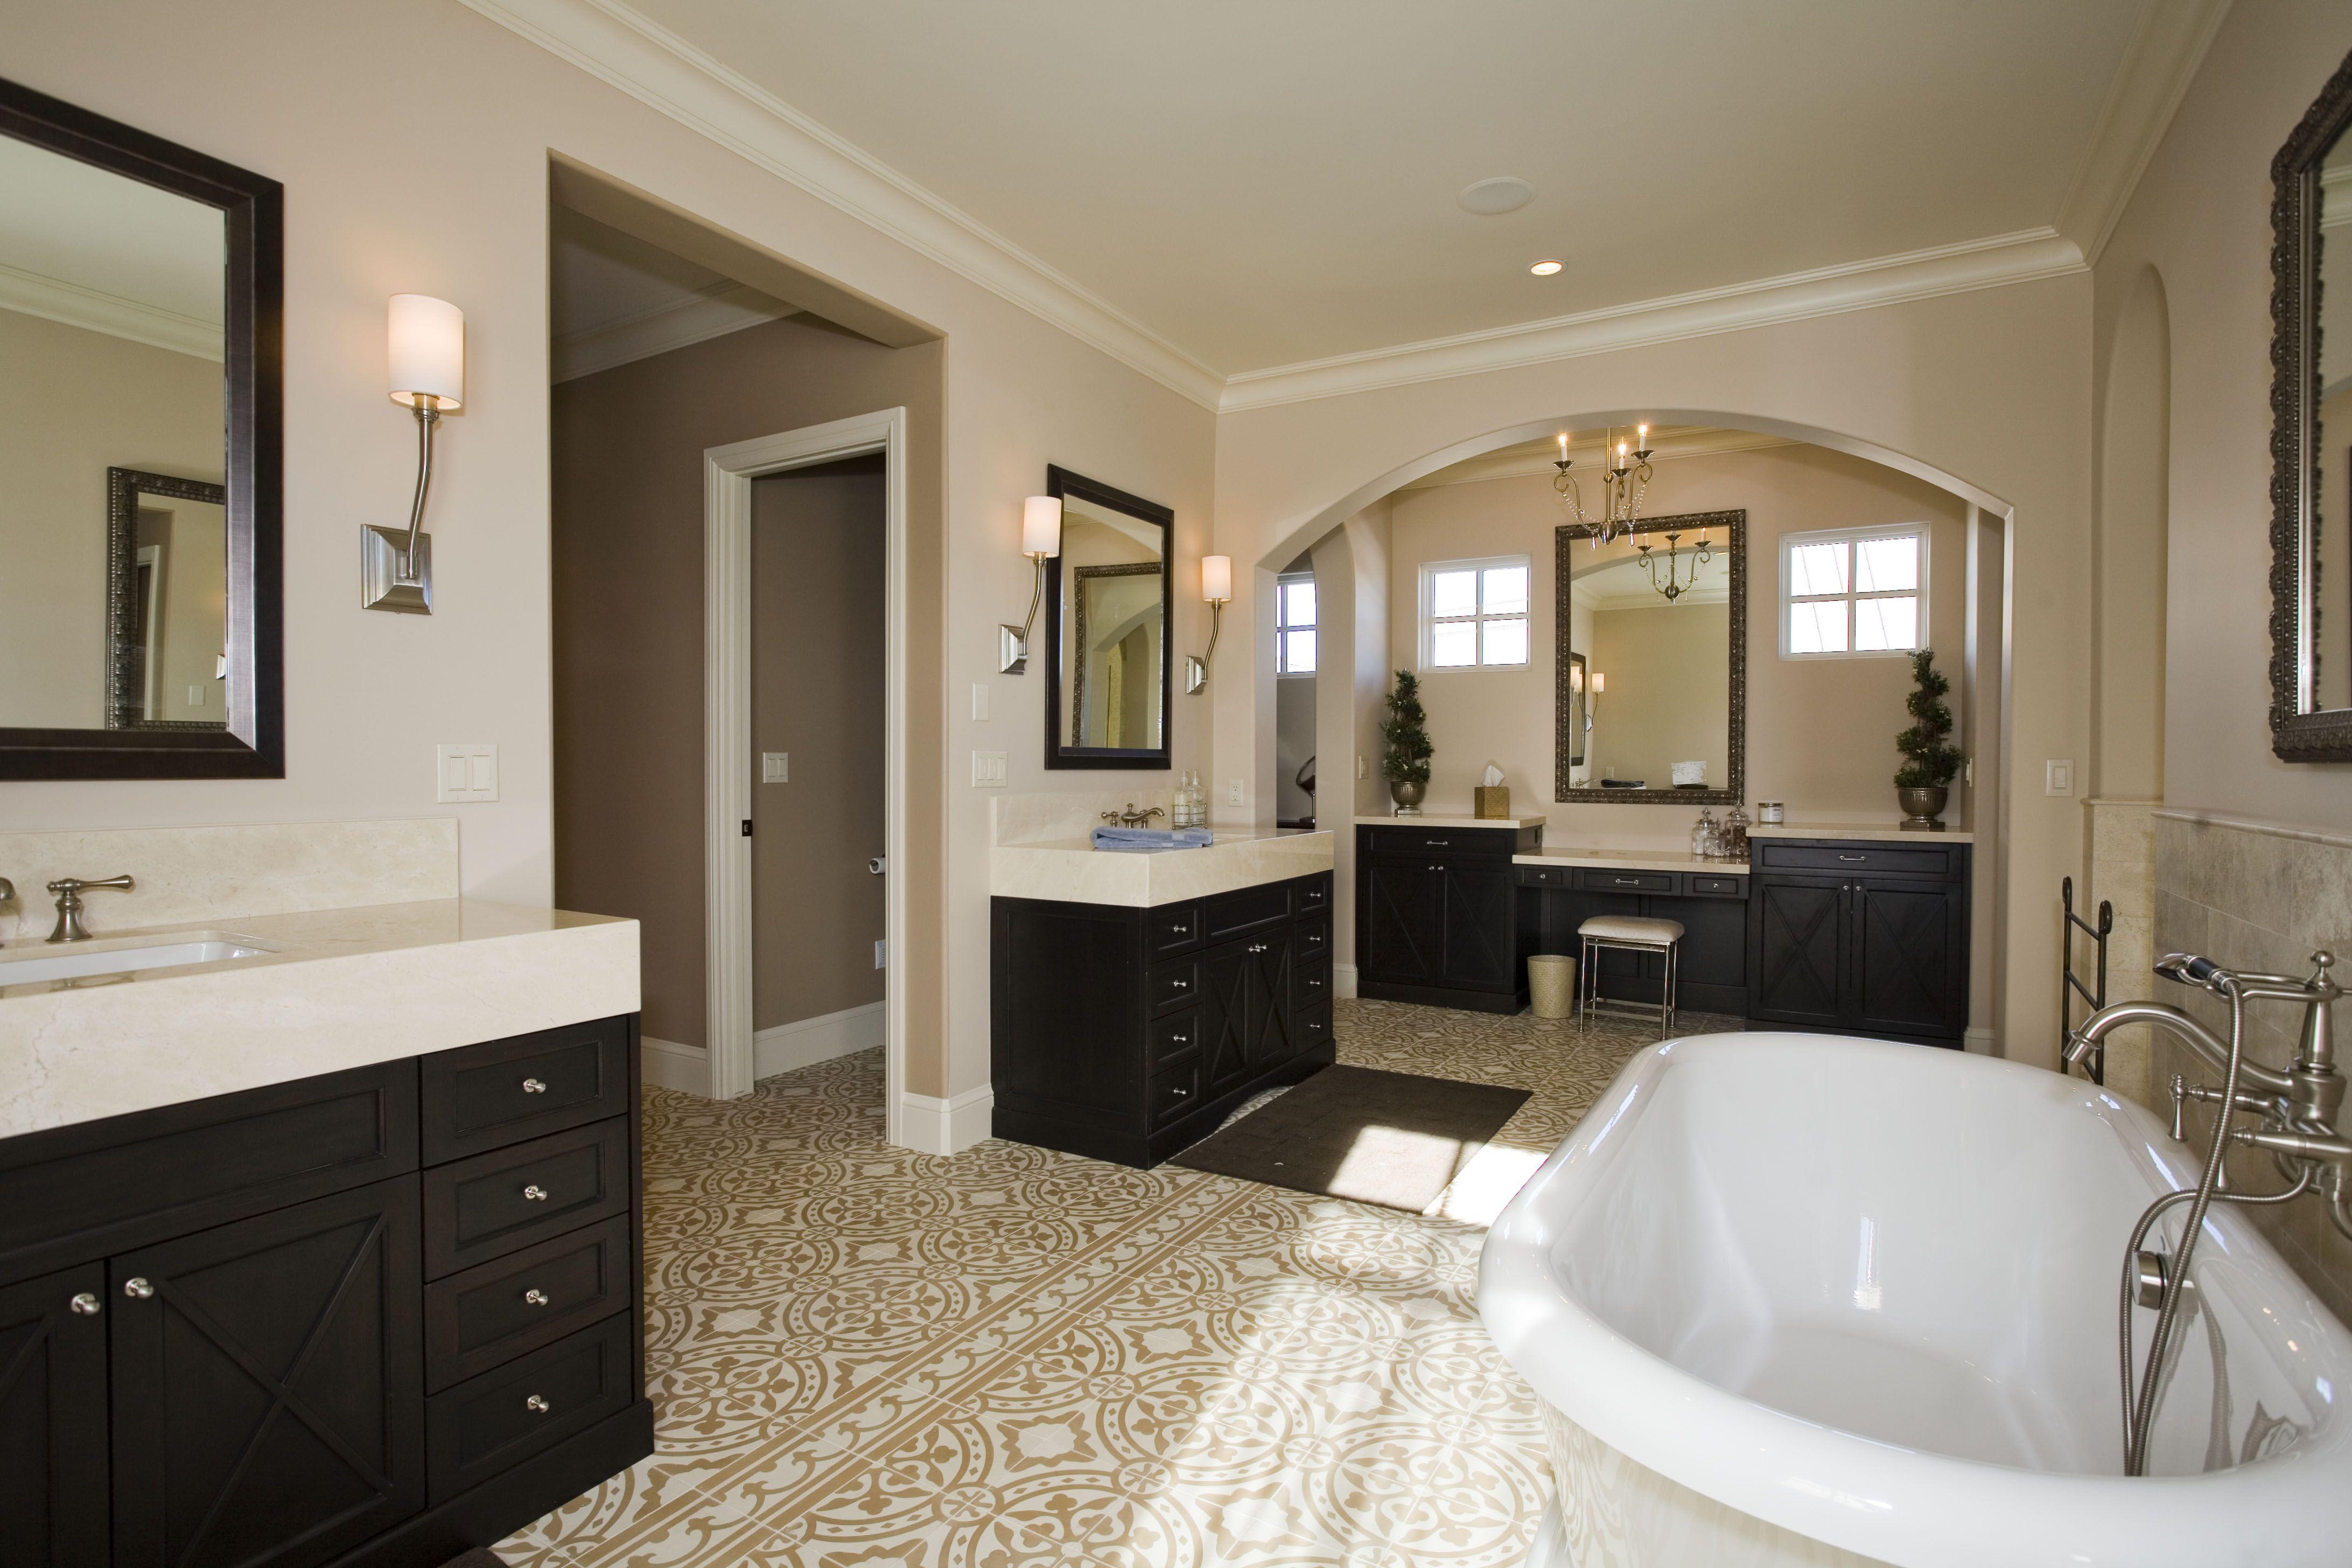 Dream master bathrooms tubs - Dream Master Bathroom Master Bathroom